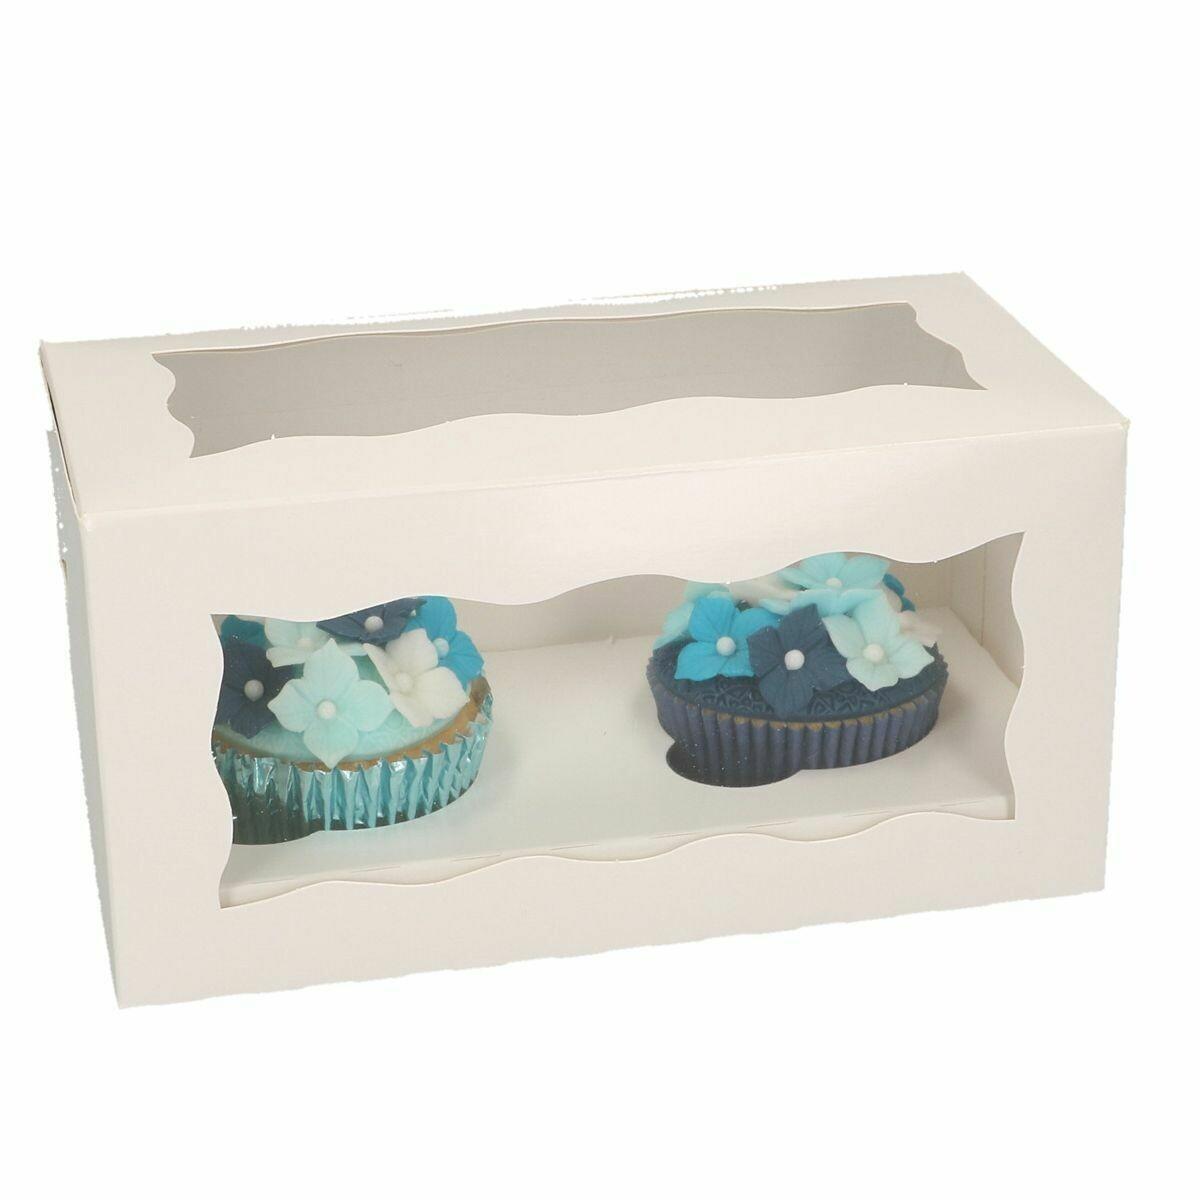 Box for 2 Cupcake/Muffin -Κουτί για 2 Καπκέϊκ/Μάφιν